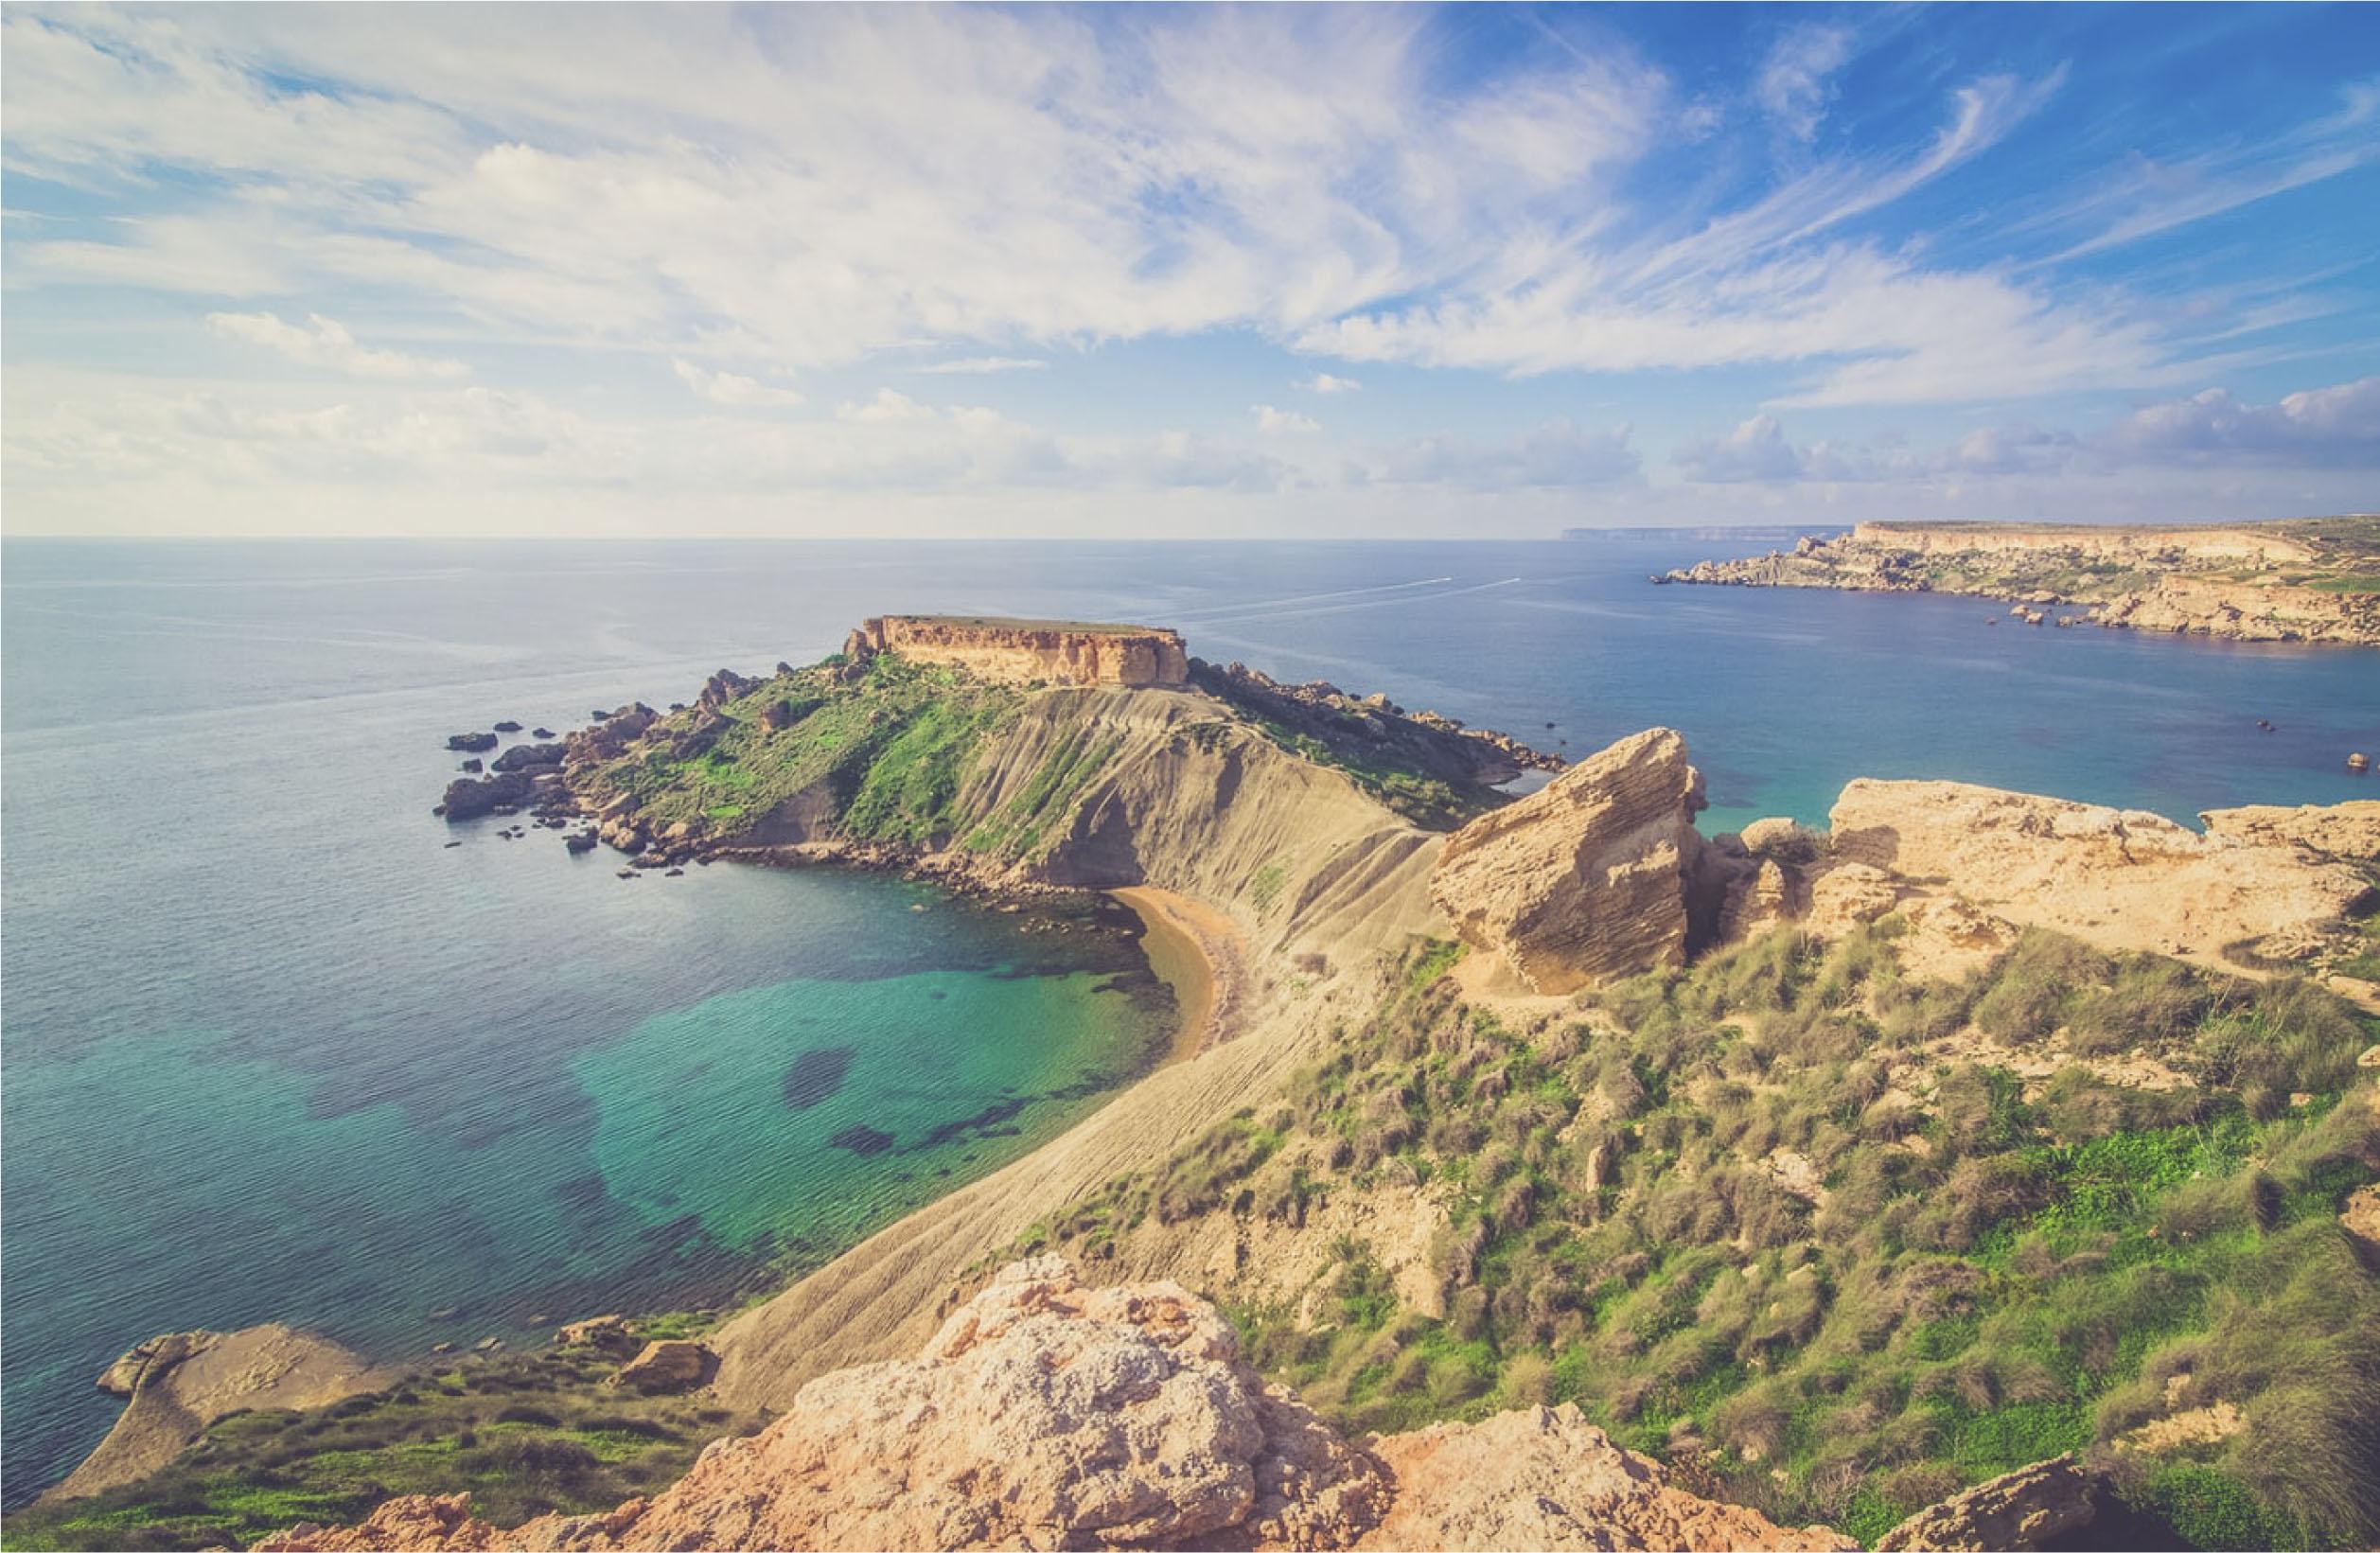 Malta - Northern Island Views